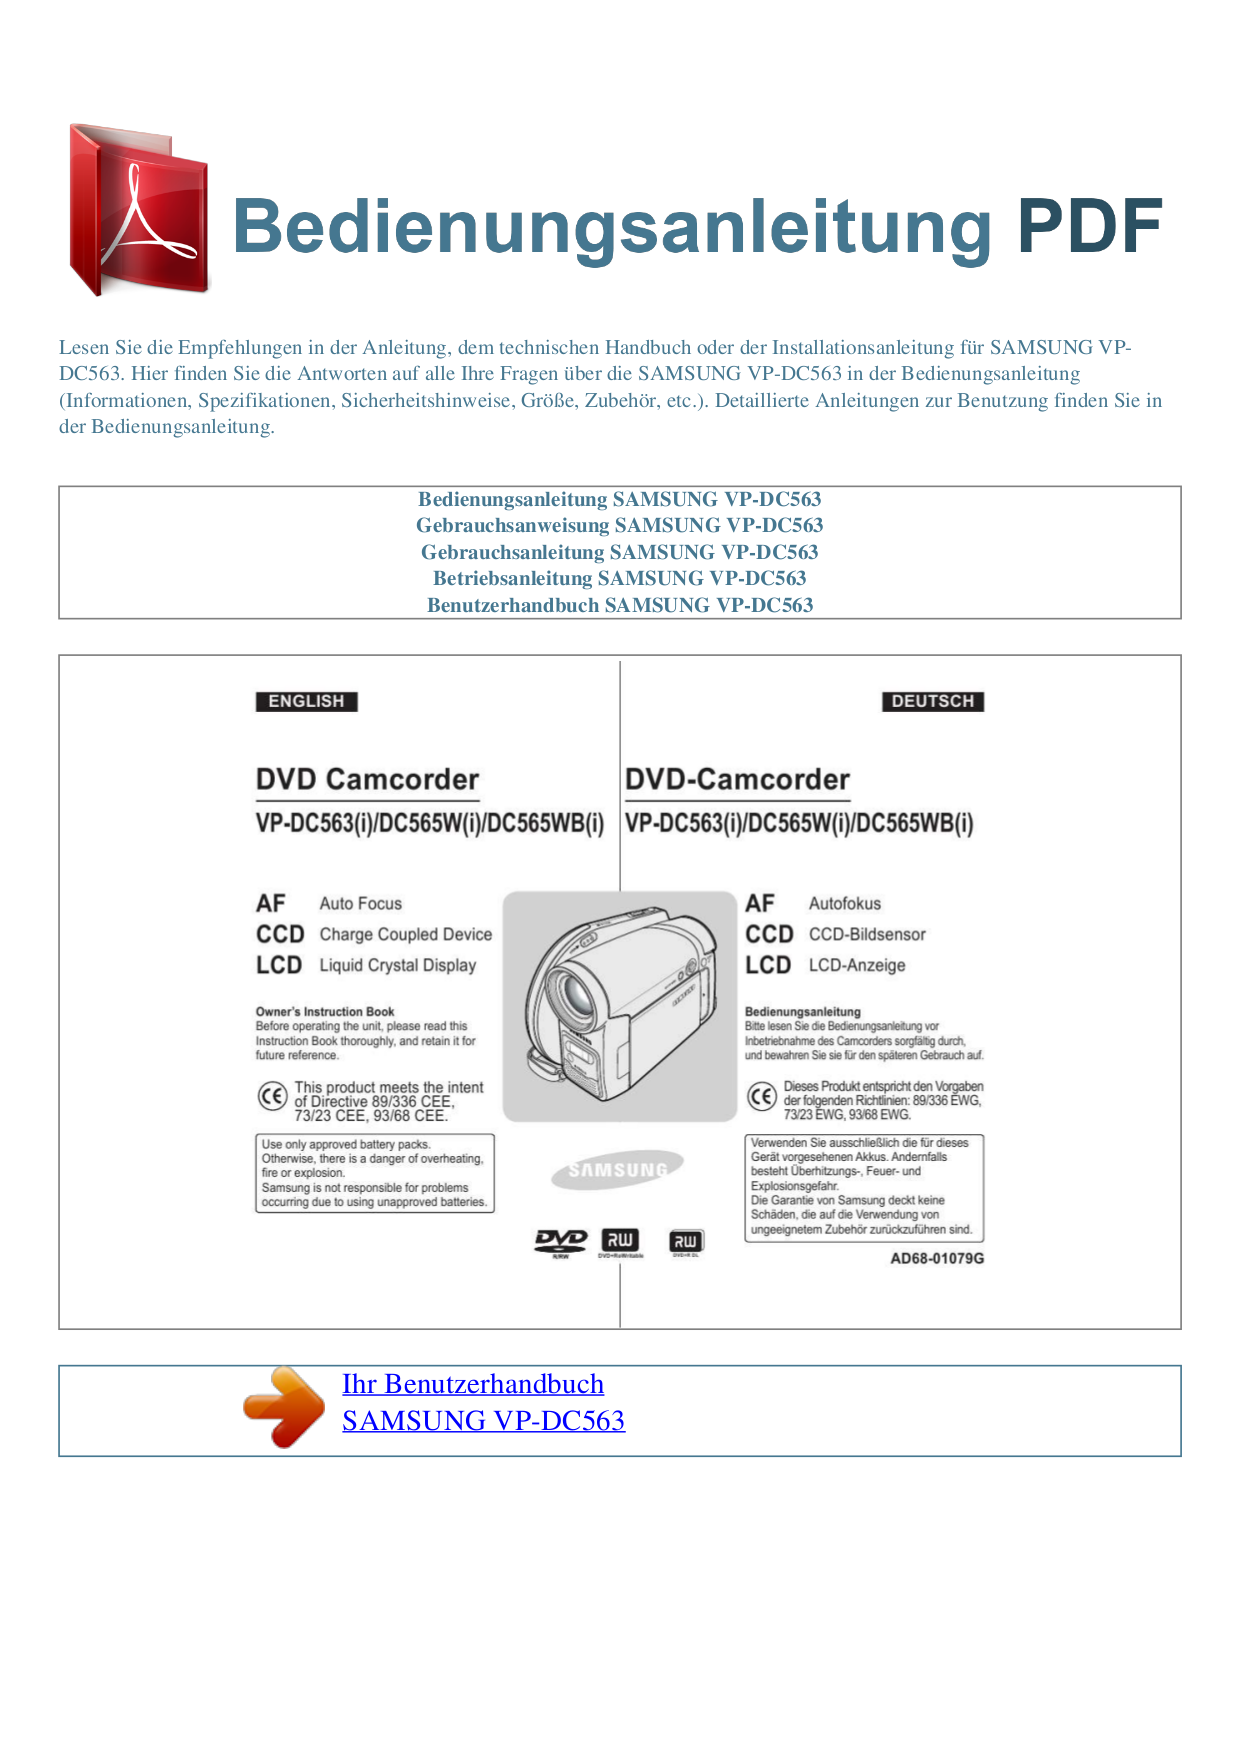 pdf for Samsung Camcorders VP-DC563 manual